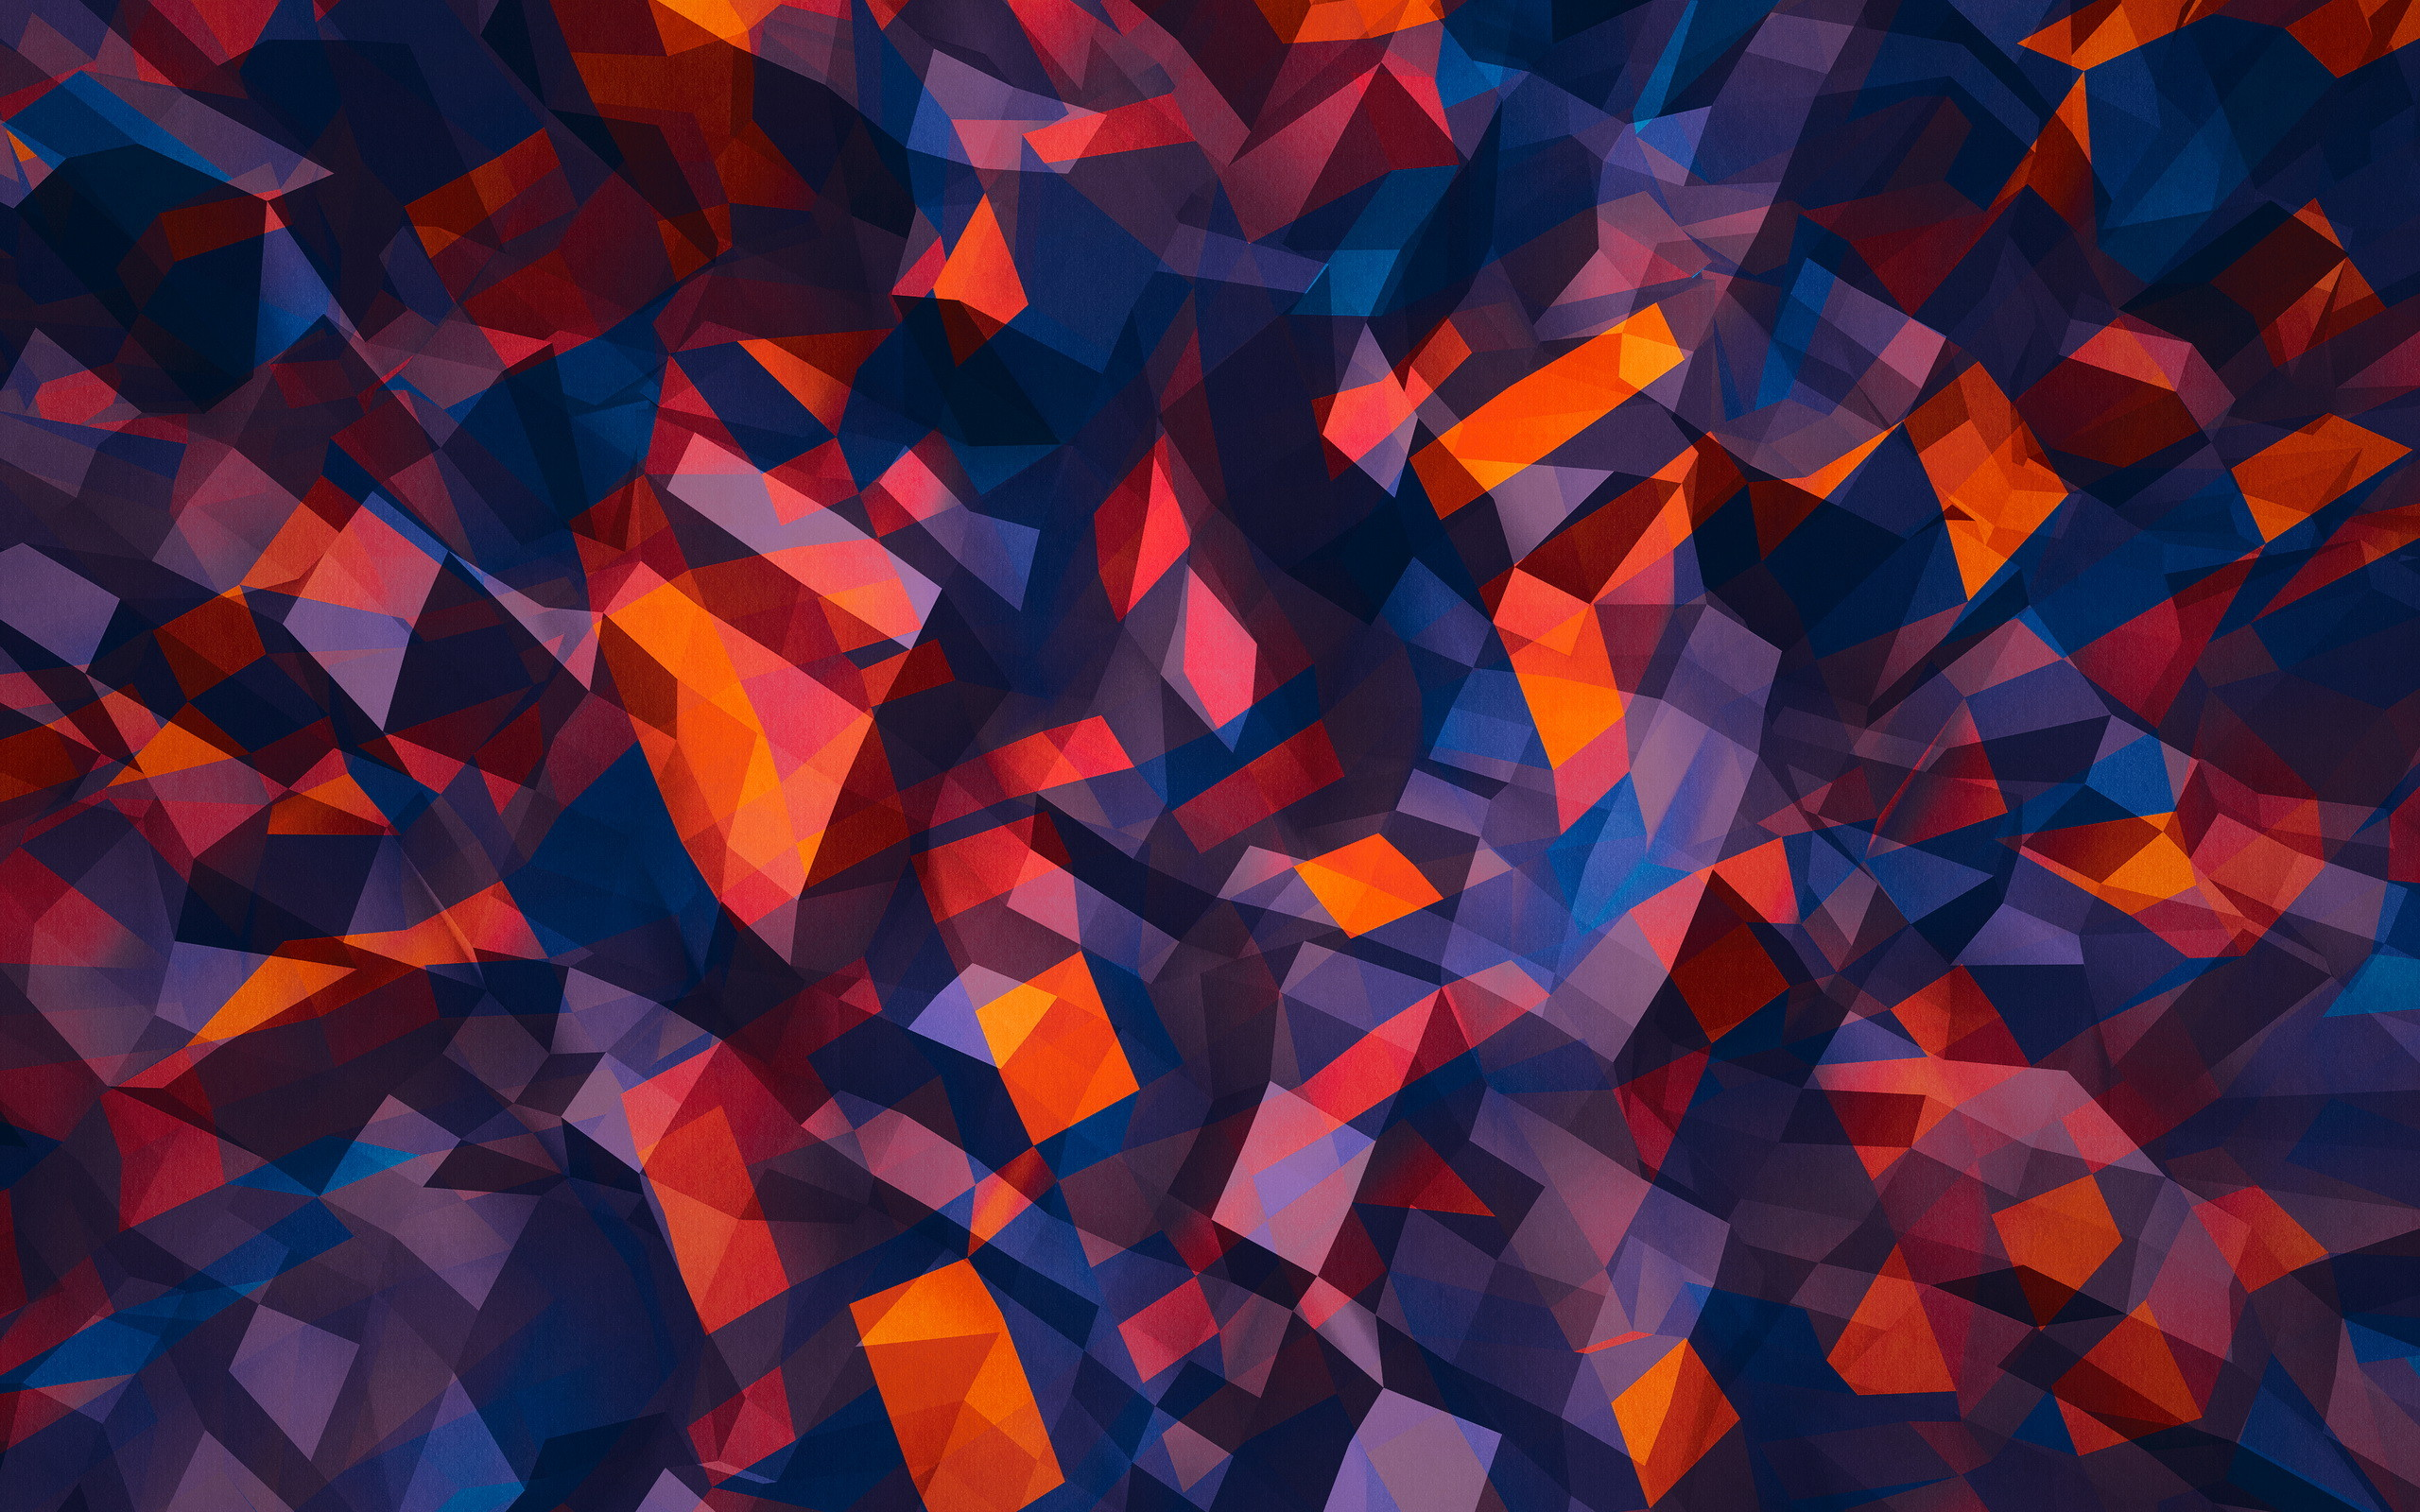 Triangle Widescreen Wallpaper